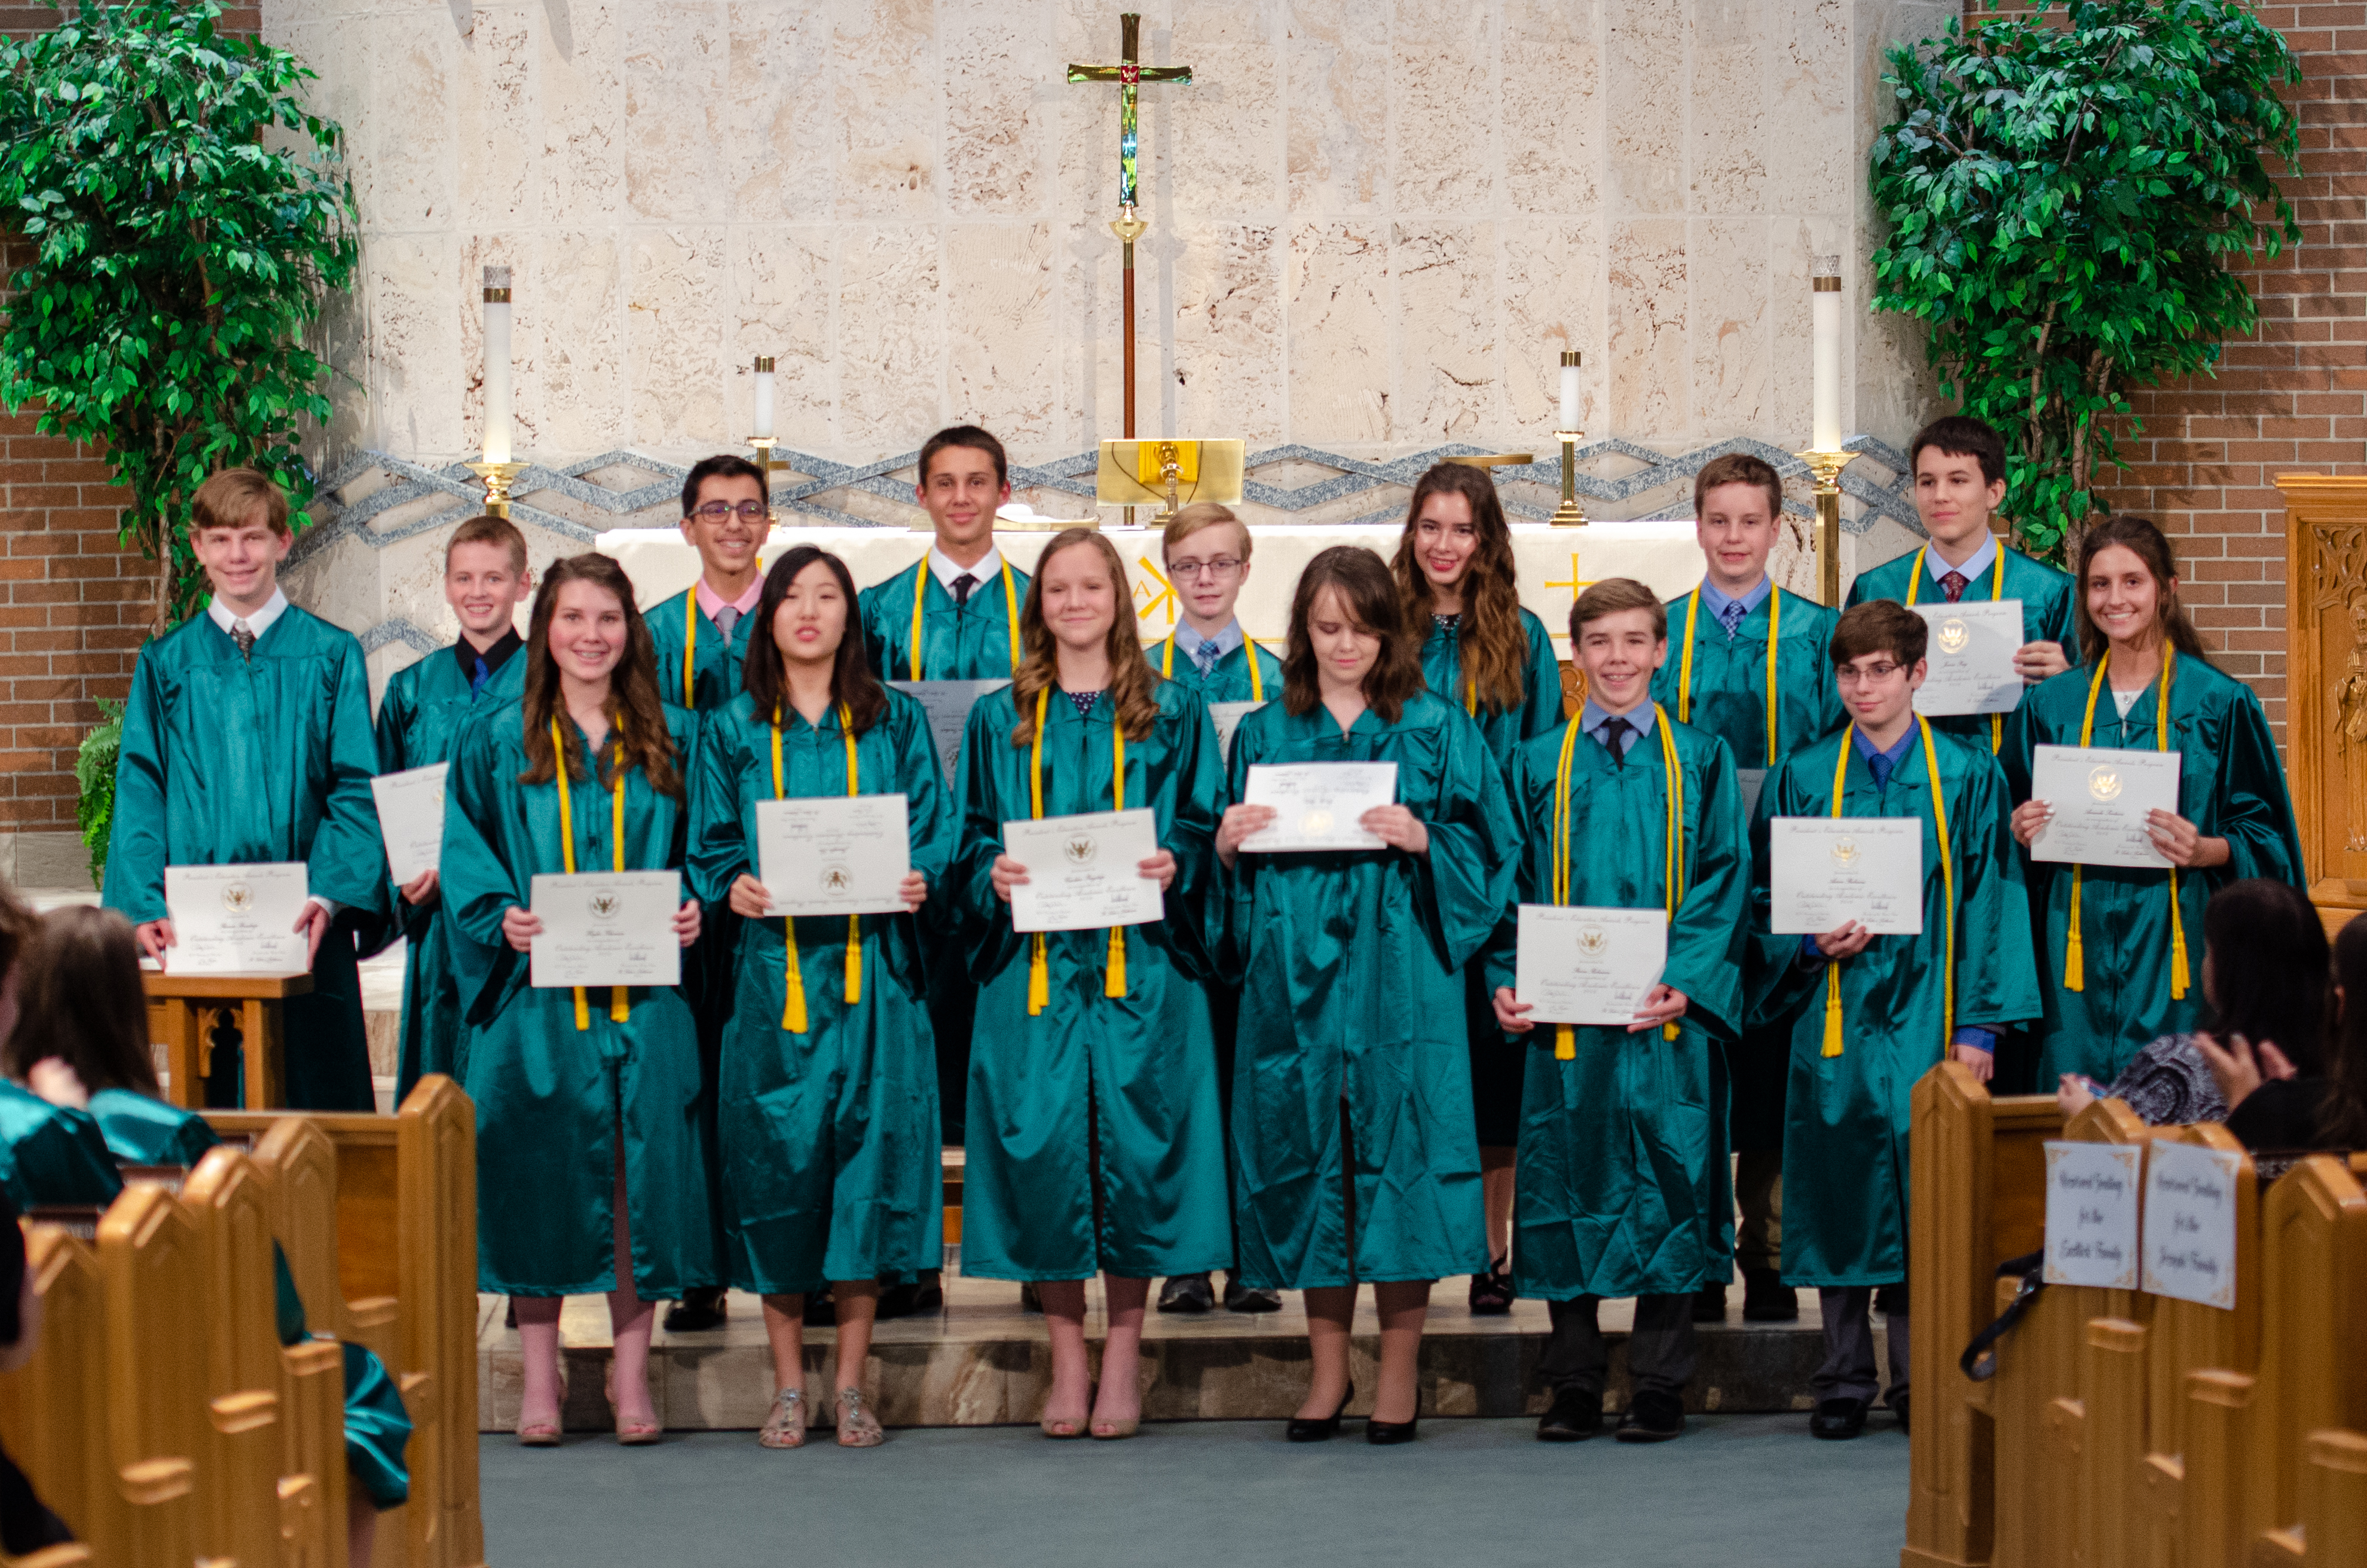 St. Luke's Graduating Class